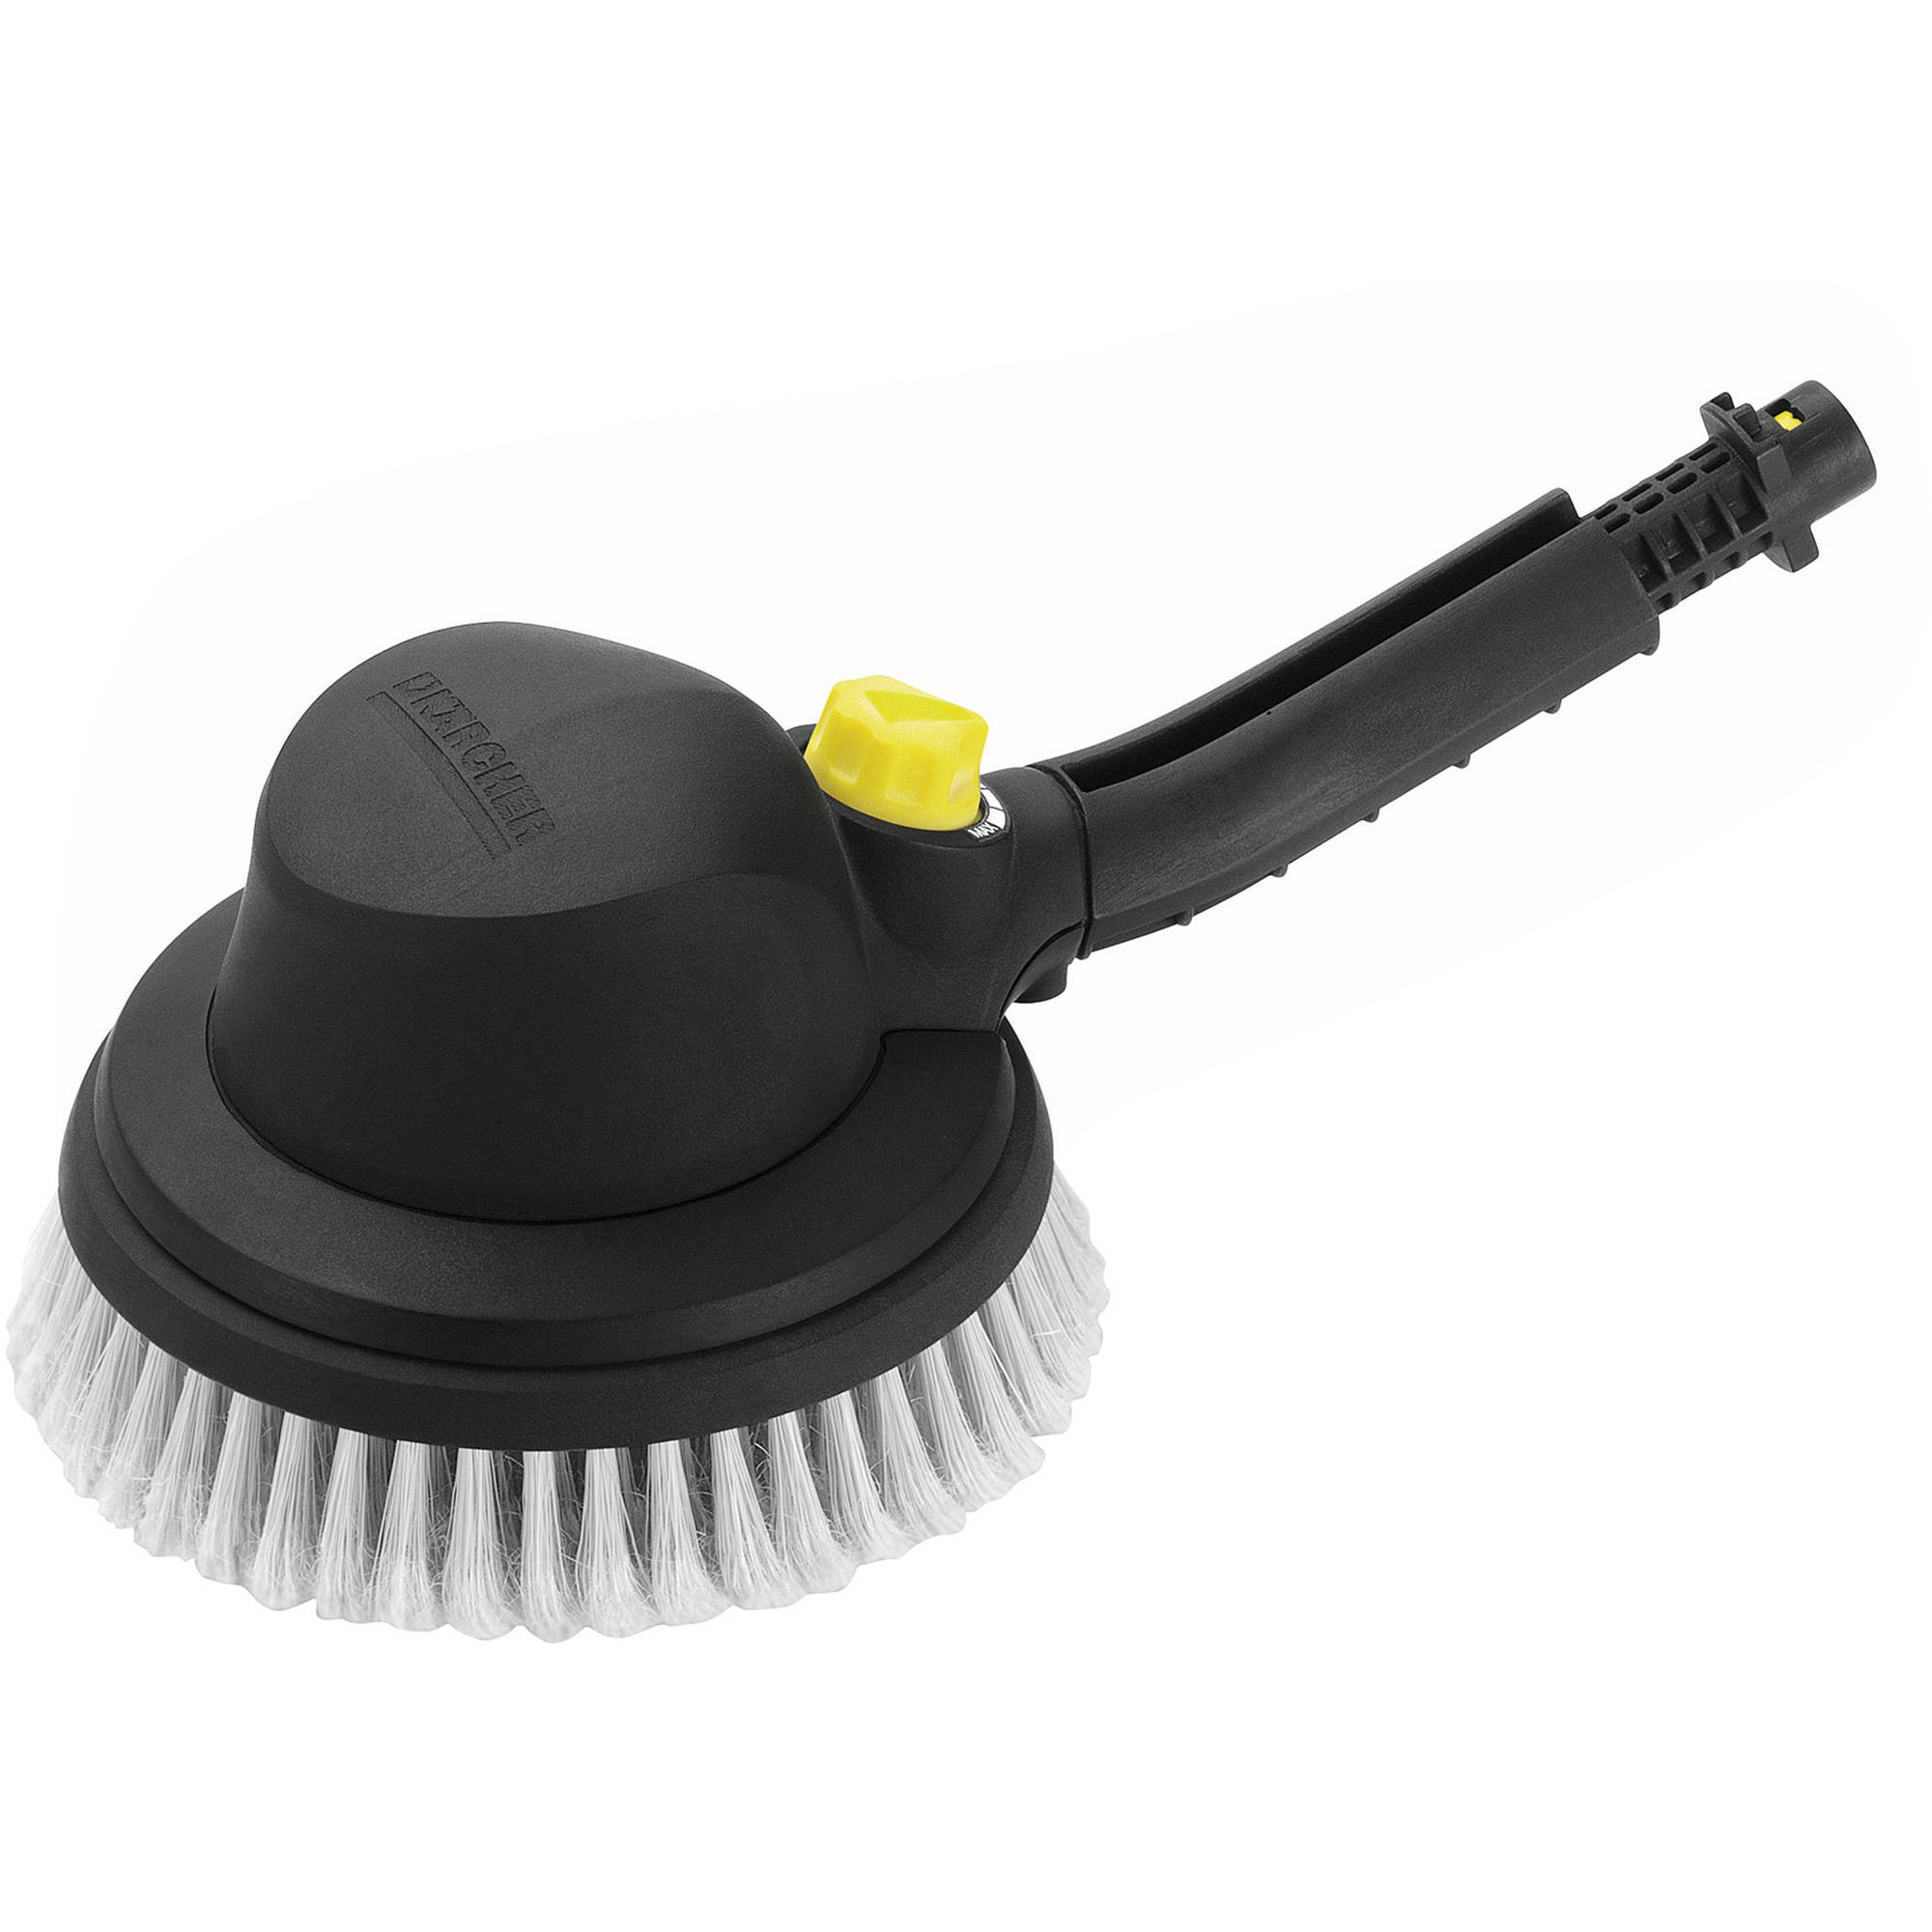 Detailer s Choice 4B369 Flow Thru Vehicle Wash Brush with 60  Telescoping  Handle   Walmart com. Detailer s Choice 4B369 Flow Thru Vehicle Wash Brush with 60